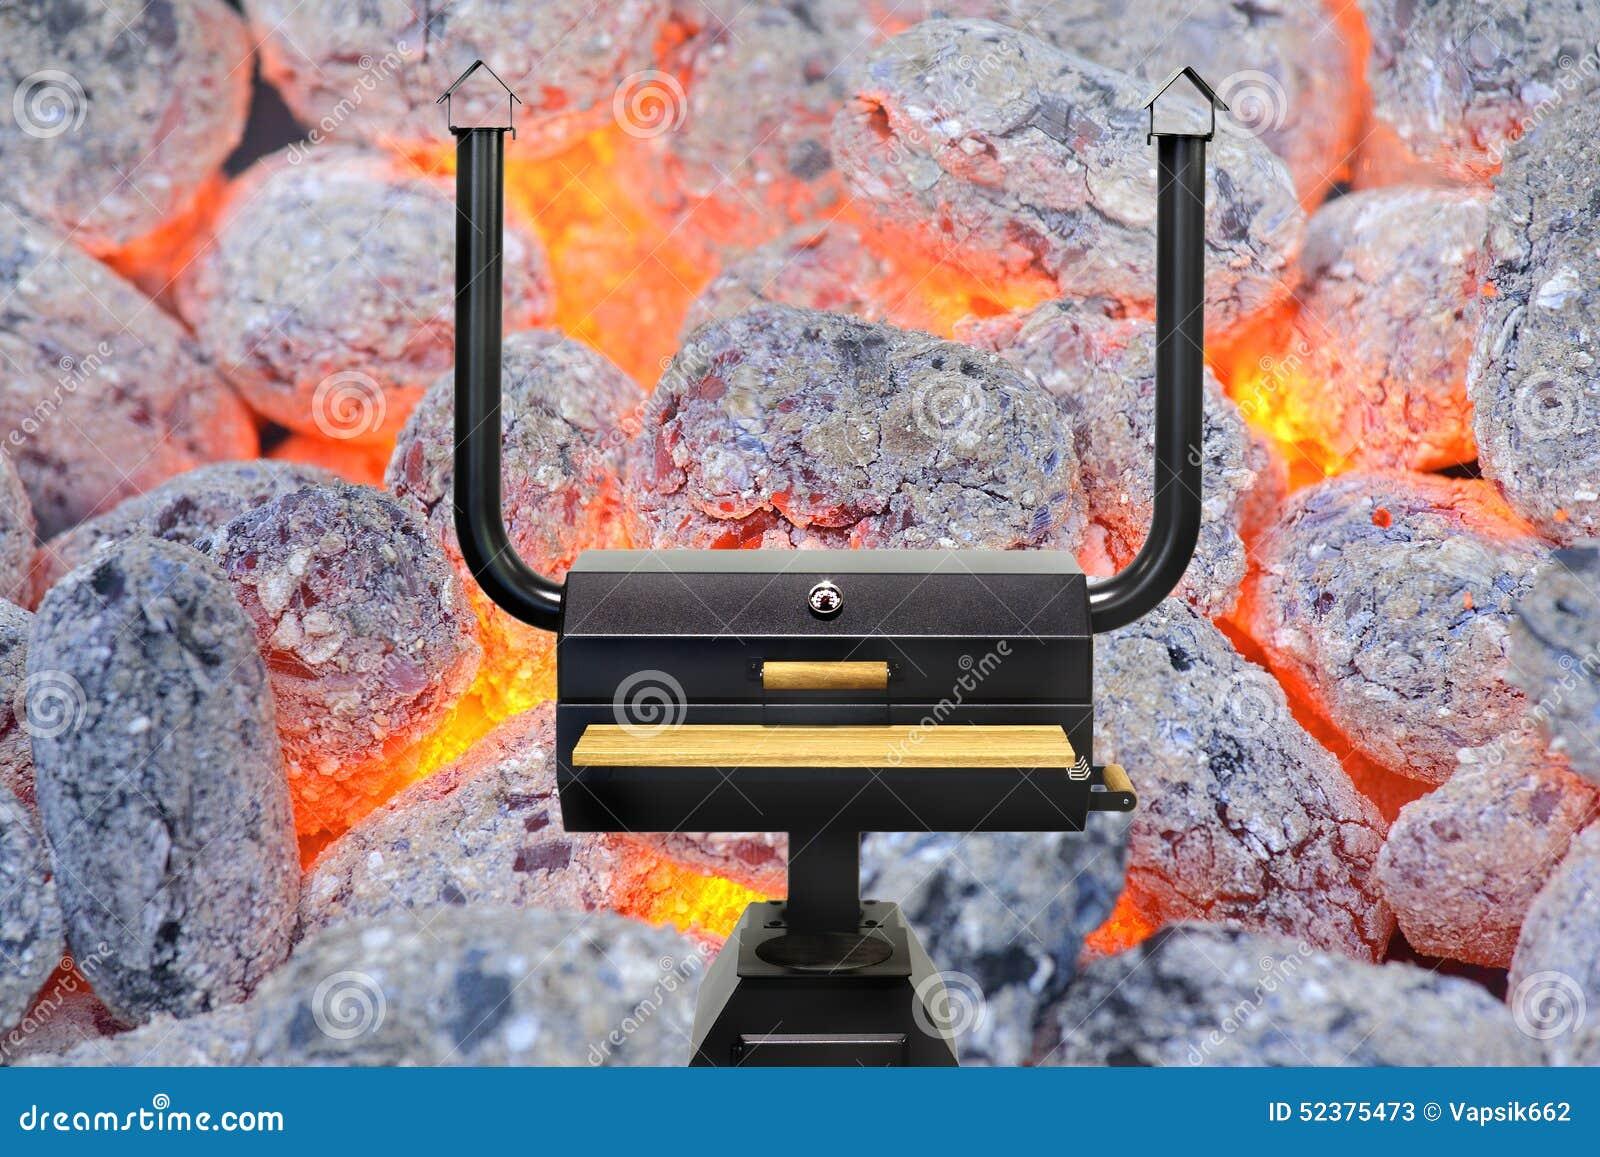 Horno de cocinar multifuncional carb n de le a que brilla - Cocinar horno de lena ...